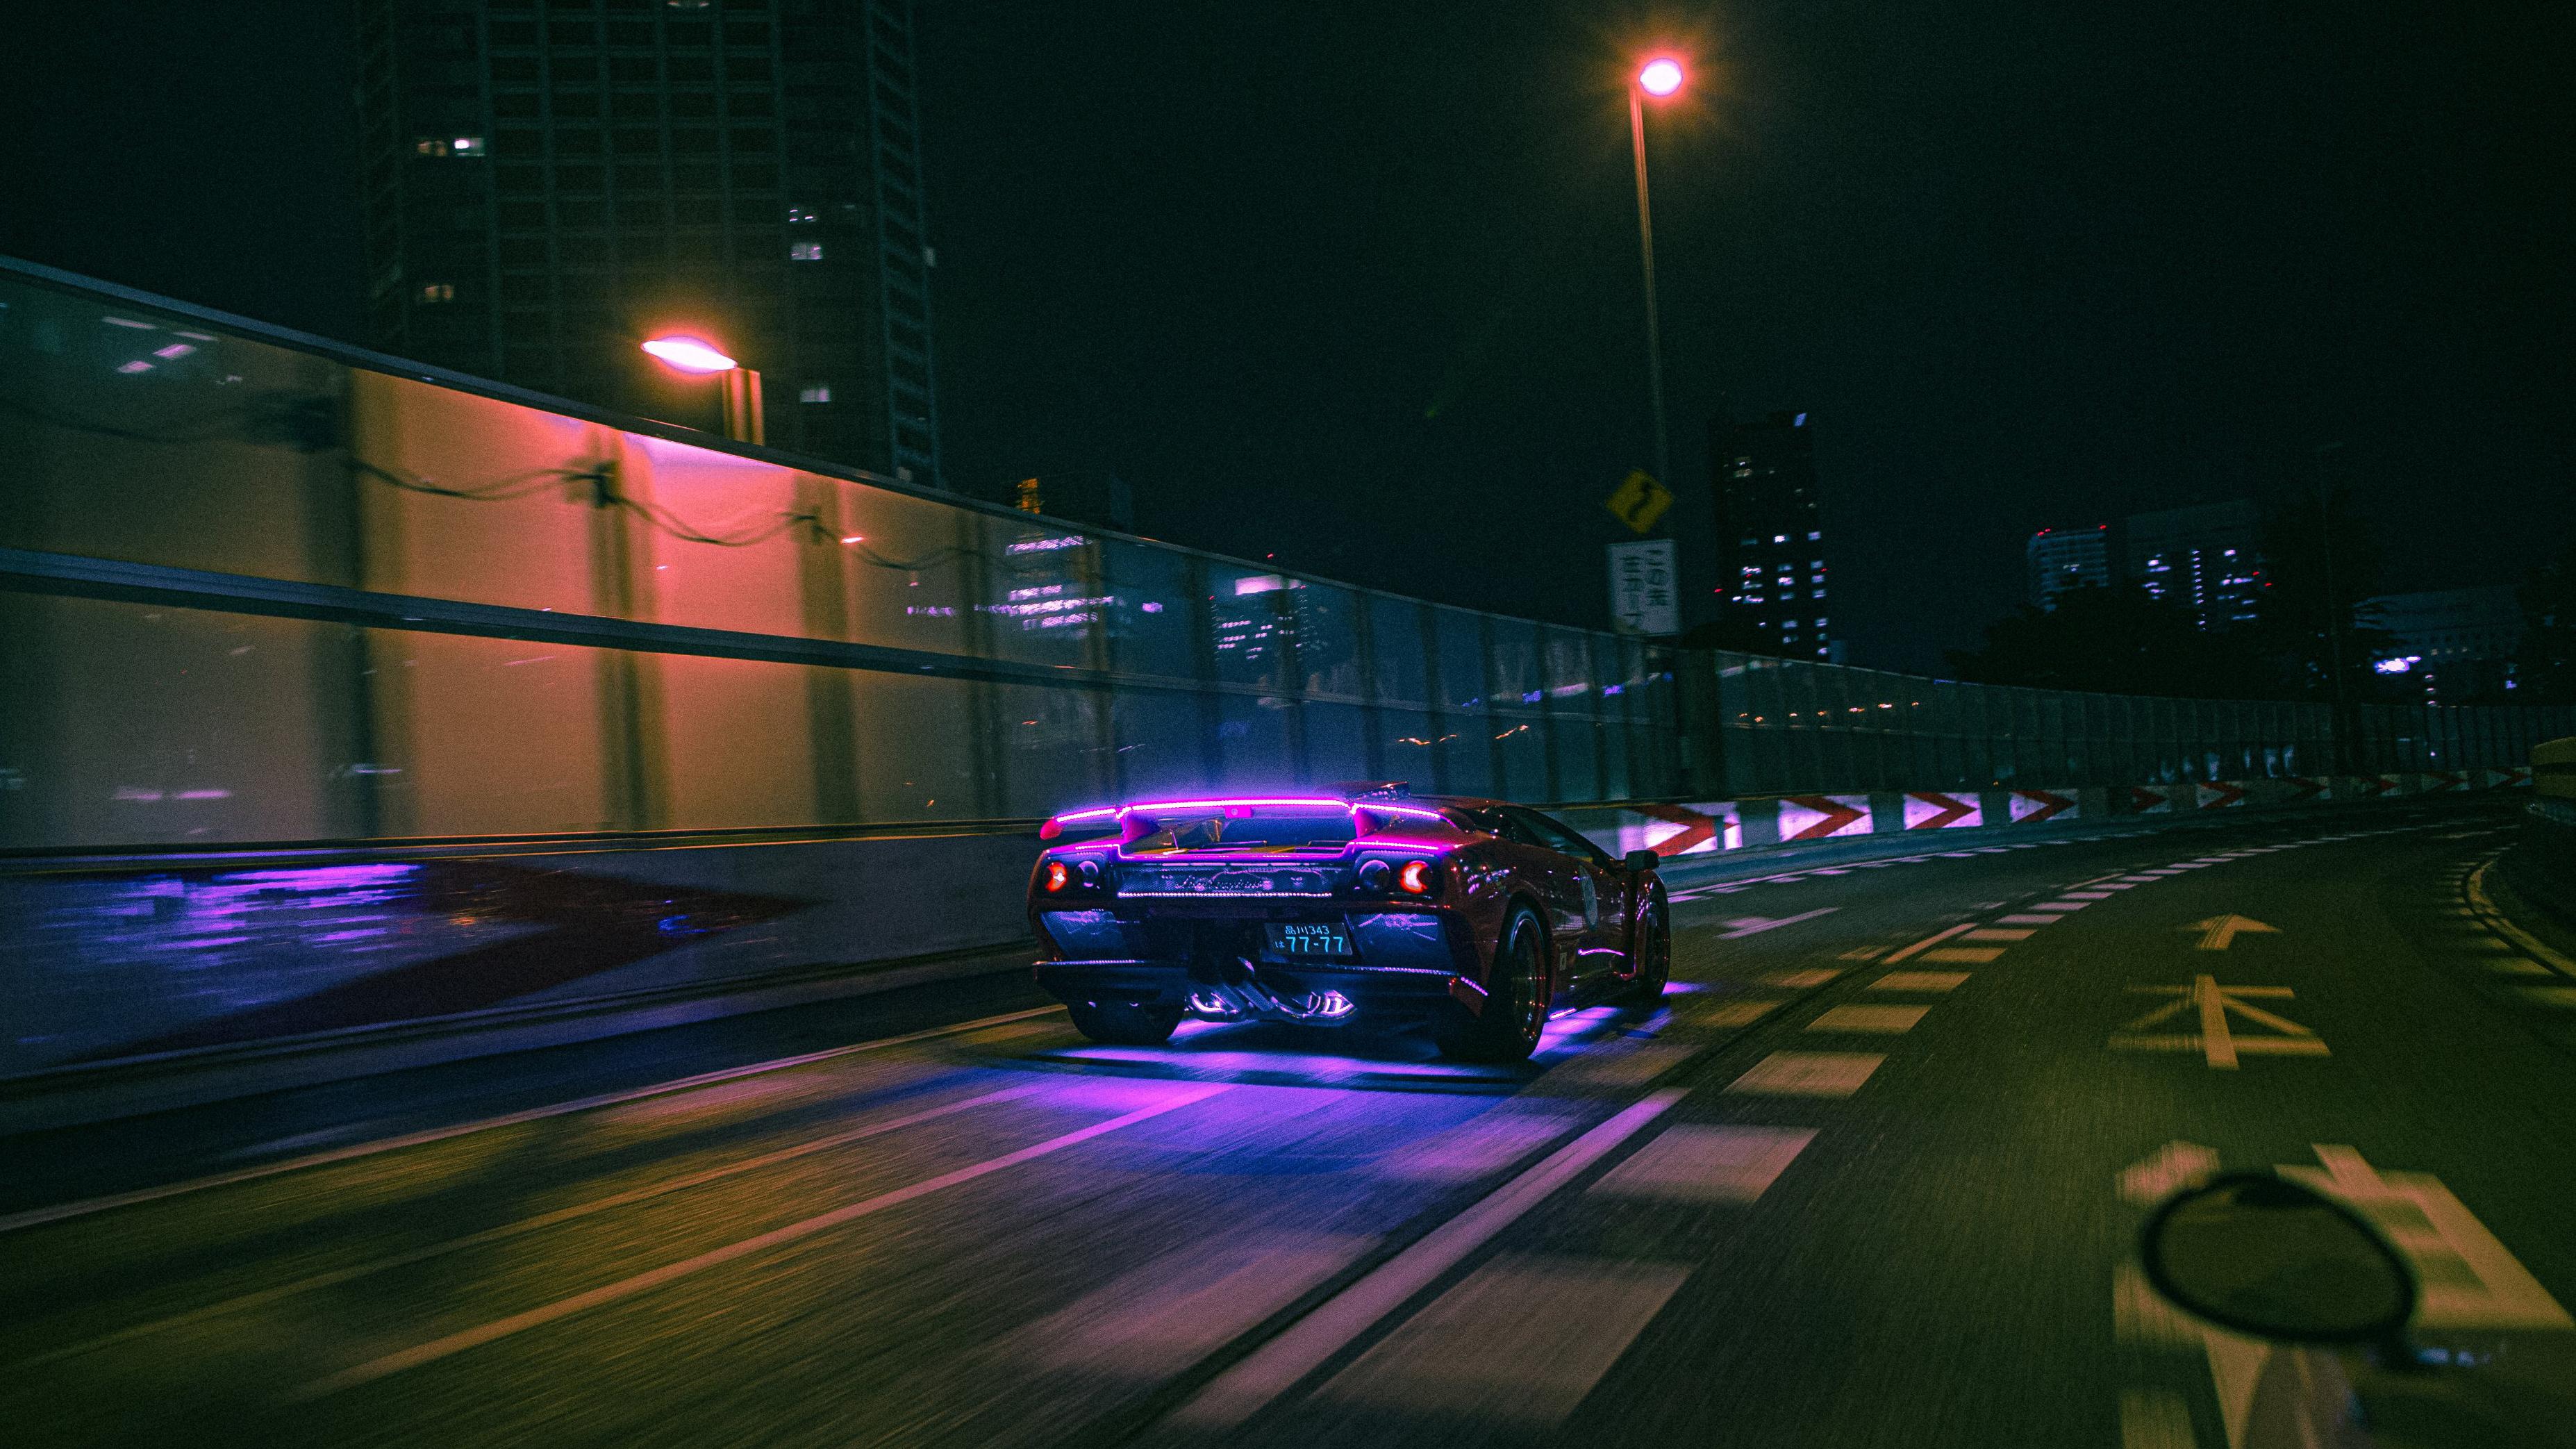 Lamborghini Neon Lights On Road 4k, HD Cars, 4k Wallpapers ...